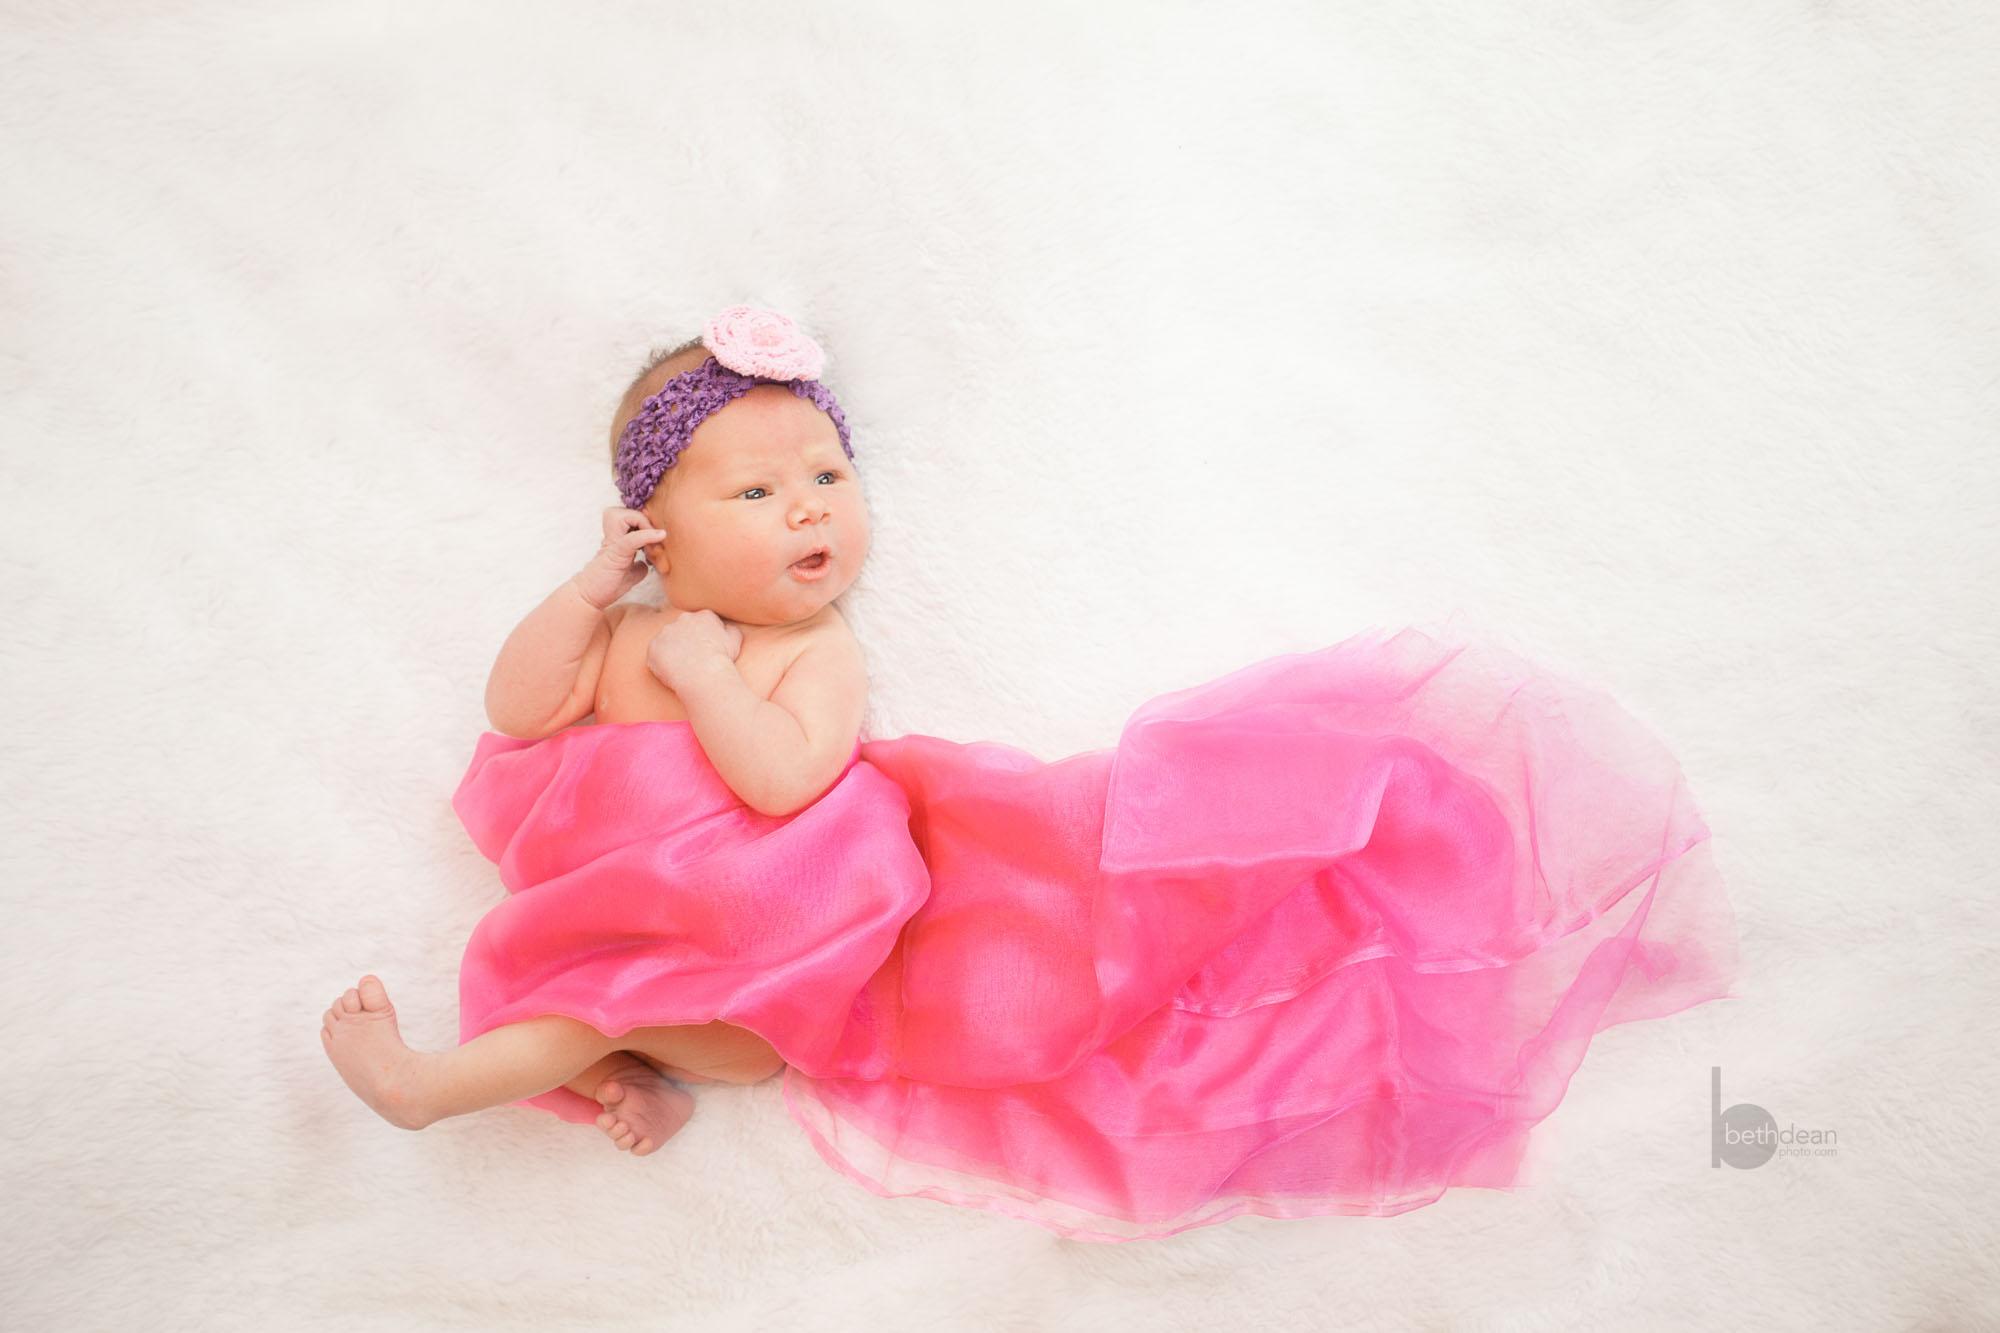 Beth Dean Photography - newborn baby girl